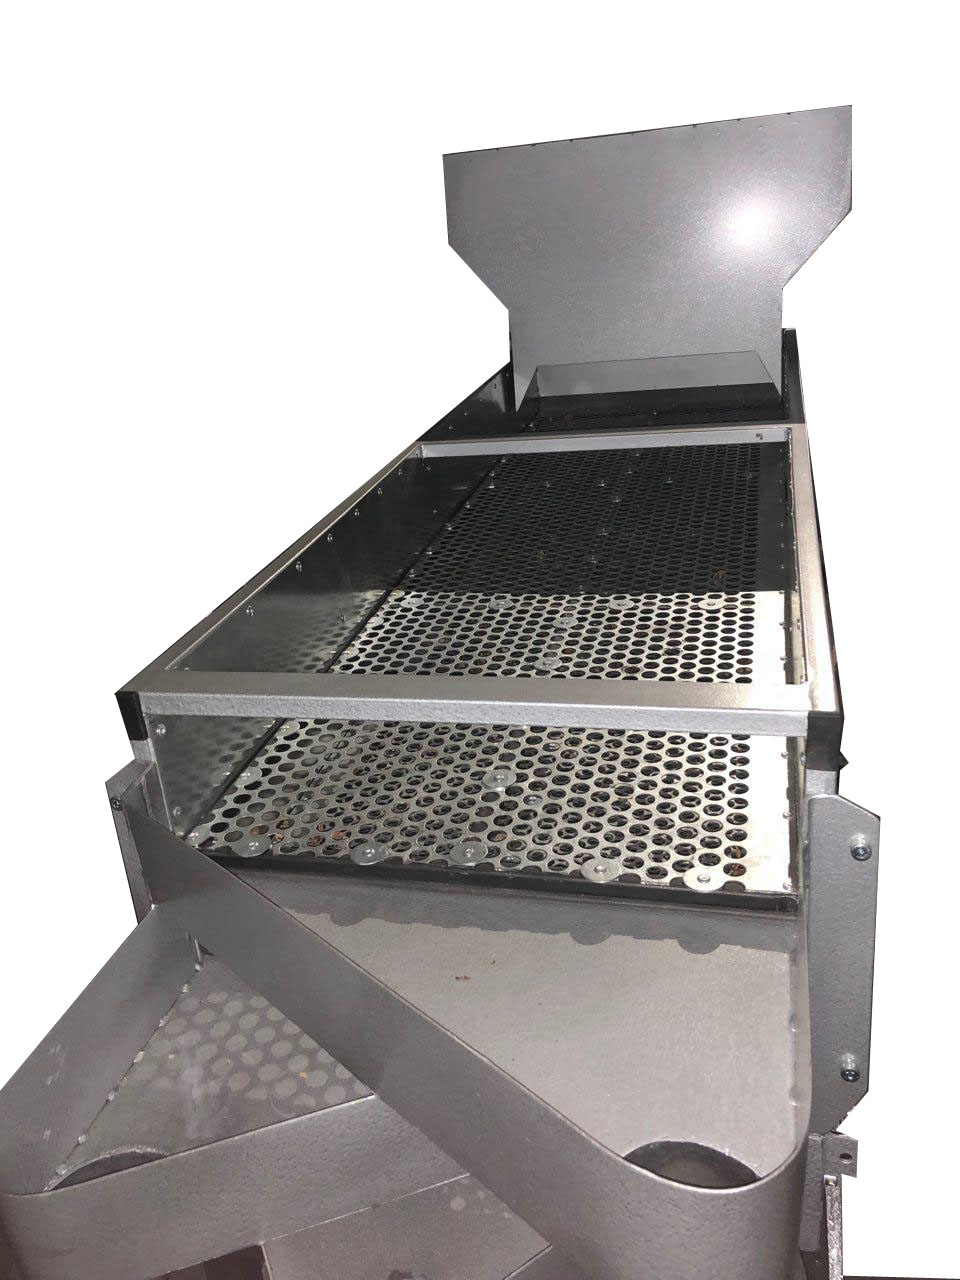 Вибросито для сортировки ядра грецкого ореха (300 кг/ч) - 2